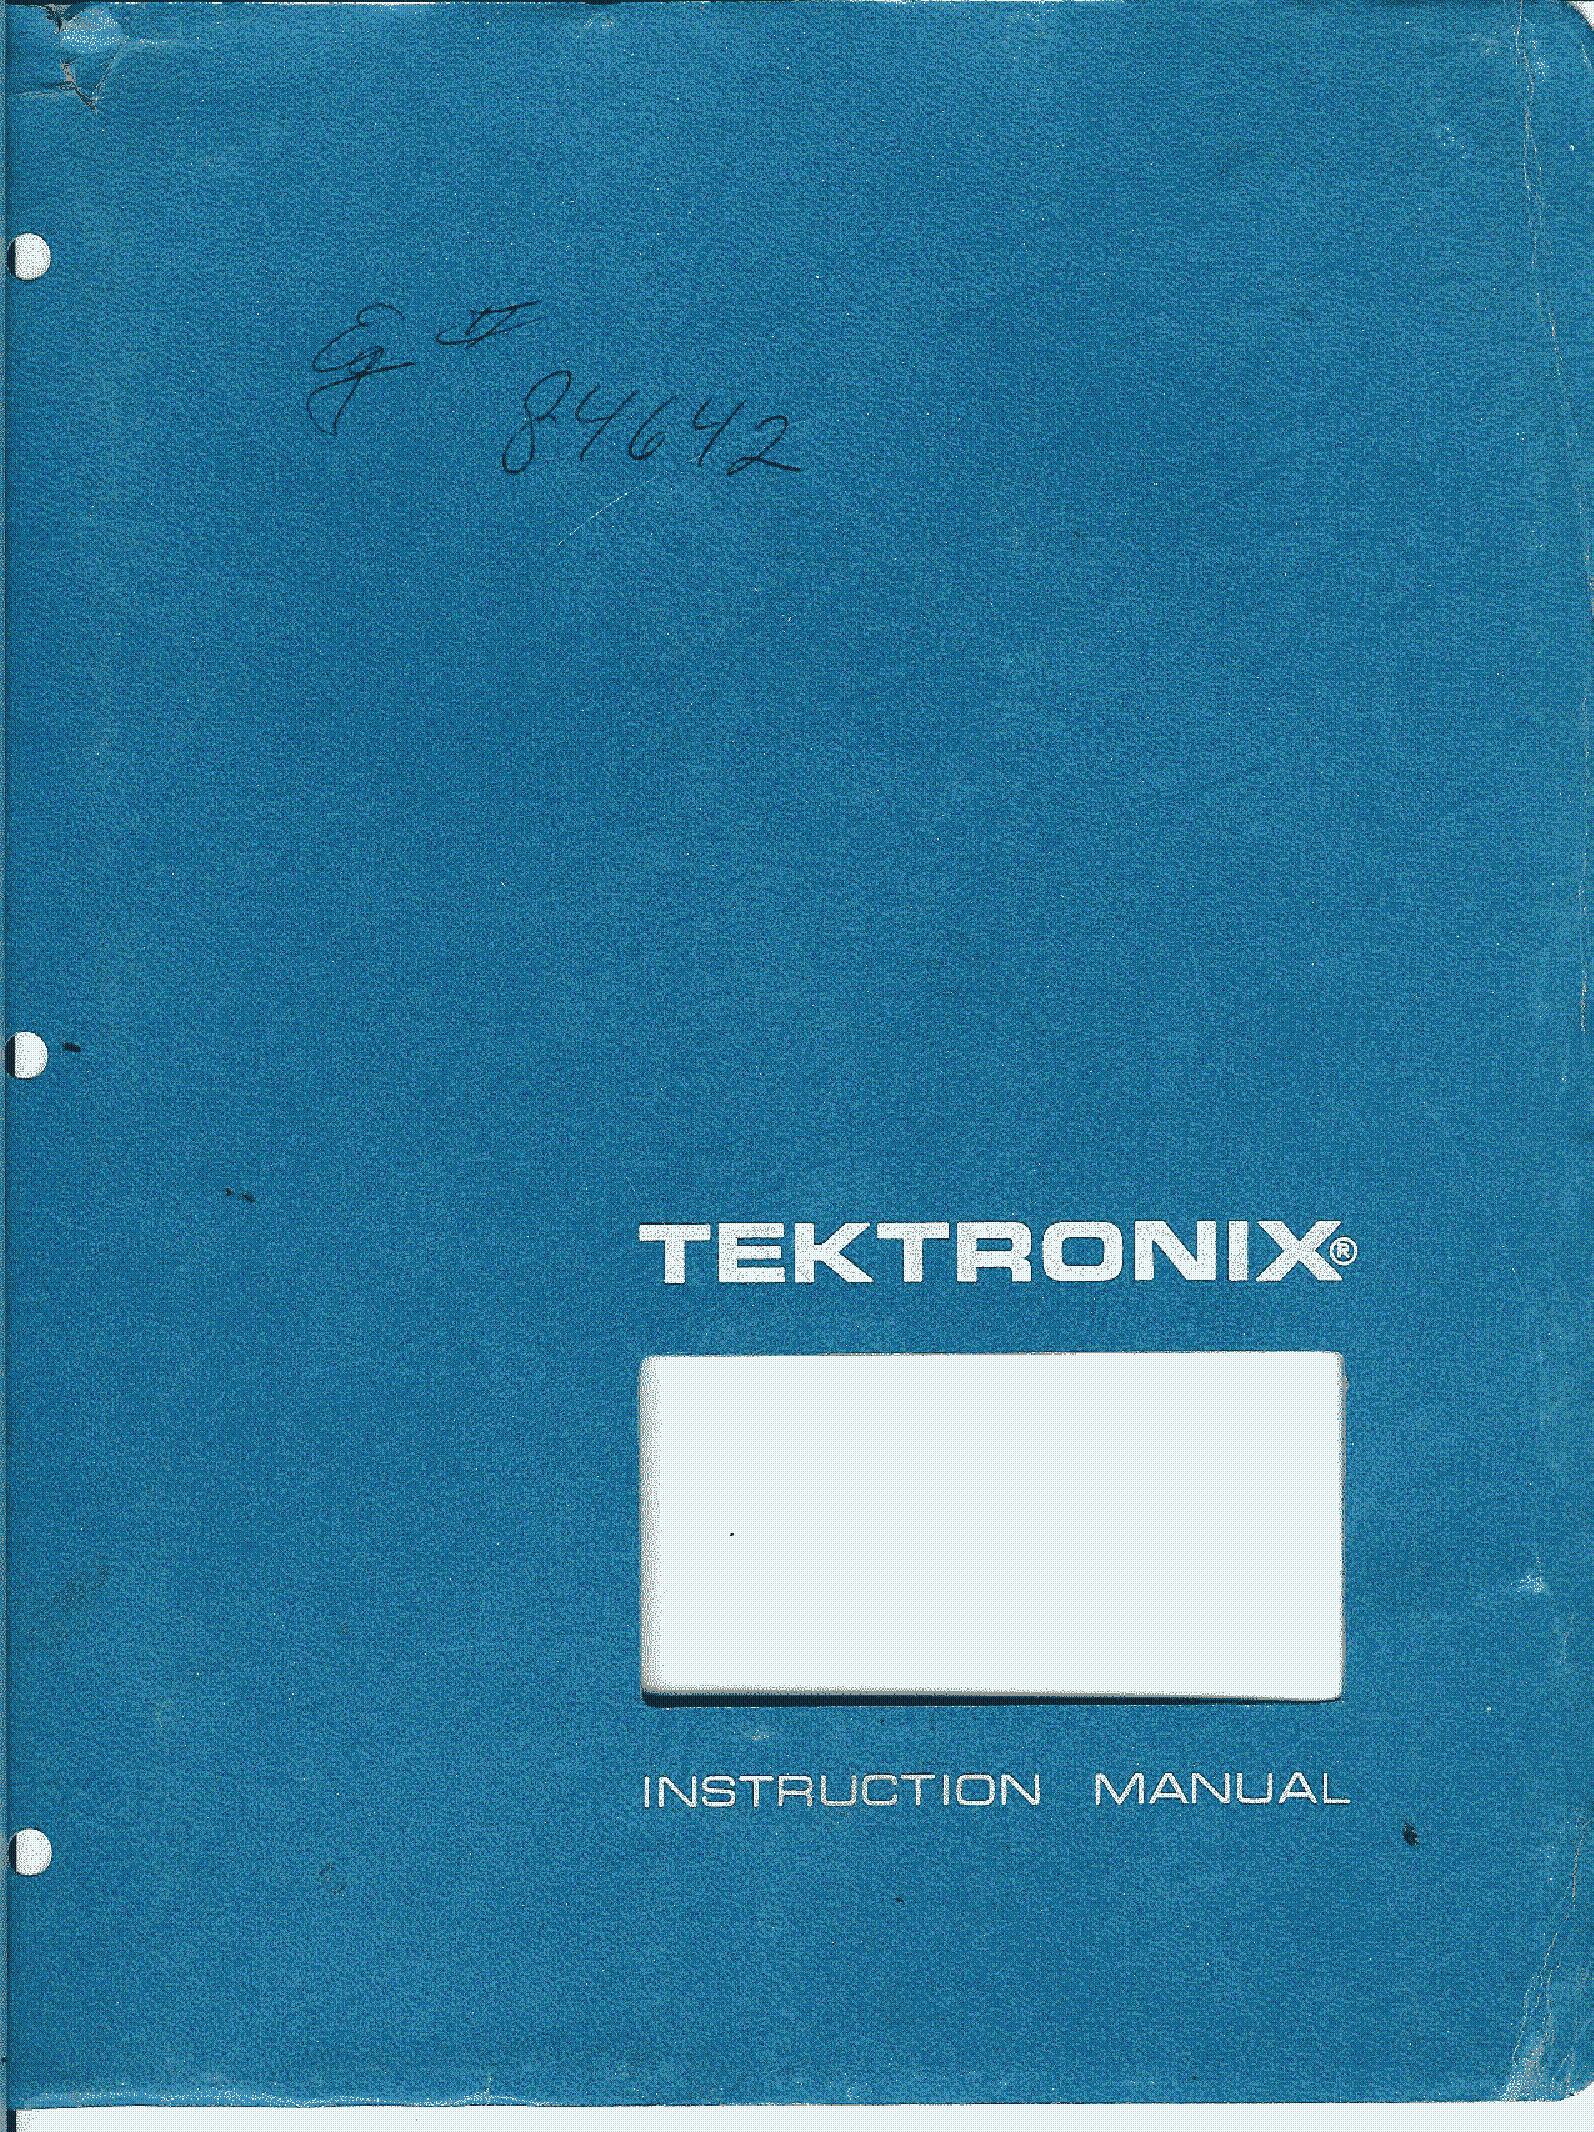 tektronix 465 oscilloscope full sm service manual download rh elektrotanya com 465B Planet Tektronix 465B Oscilloscope